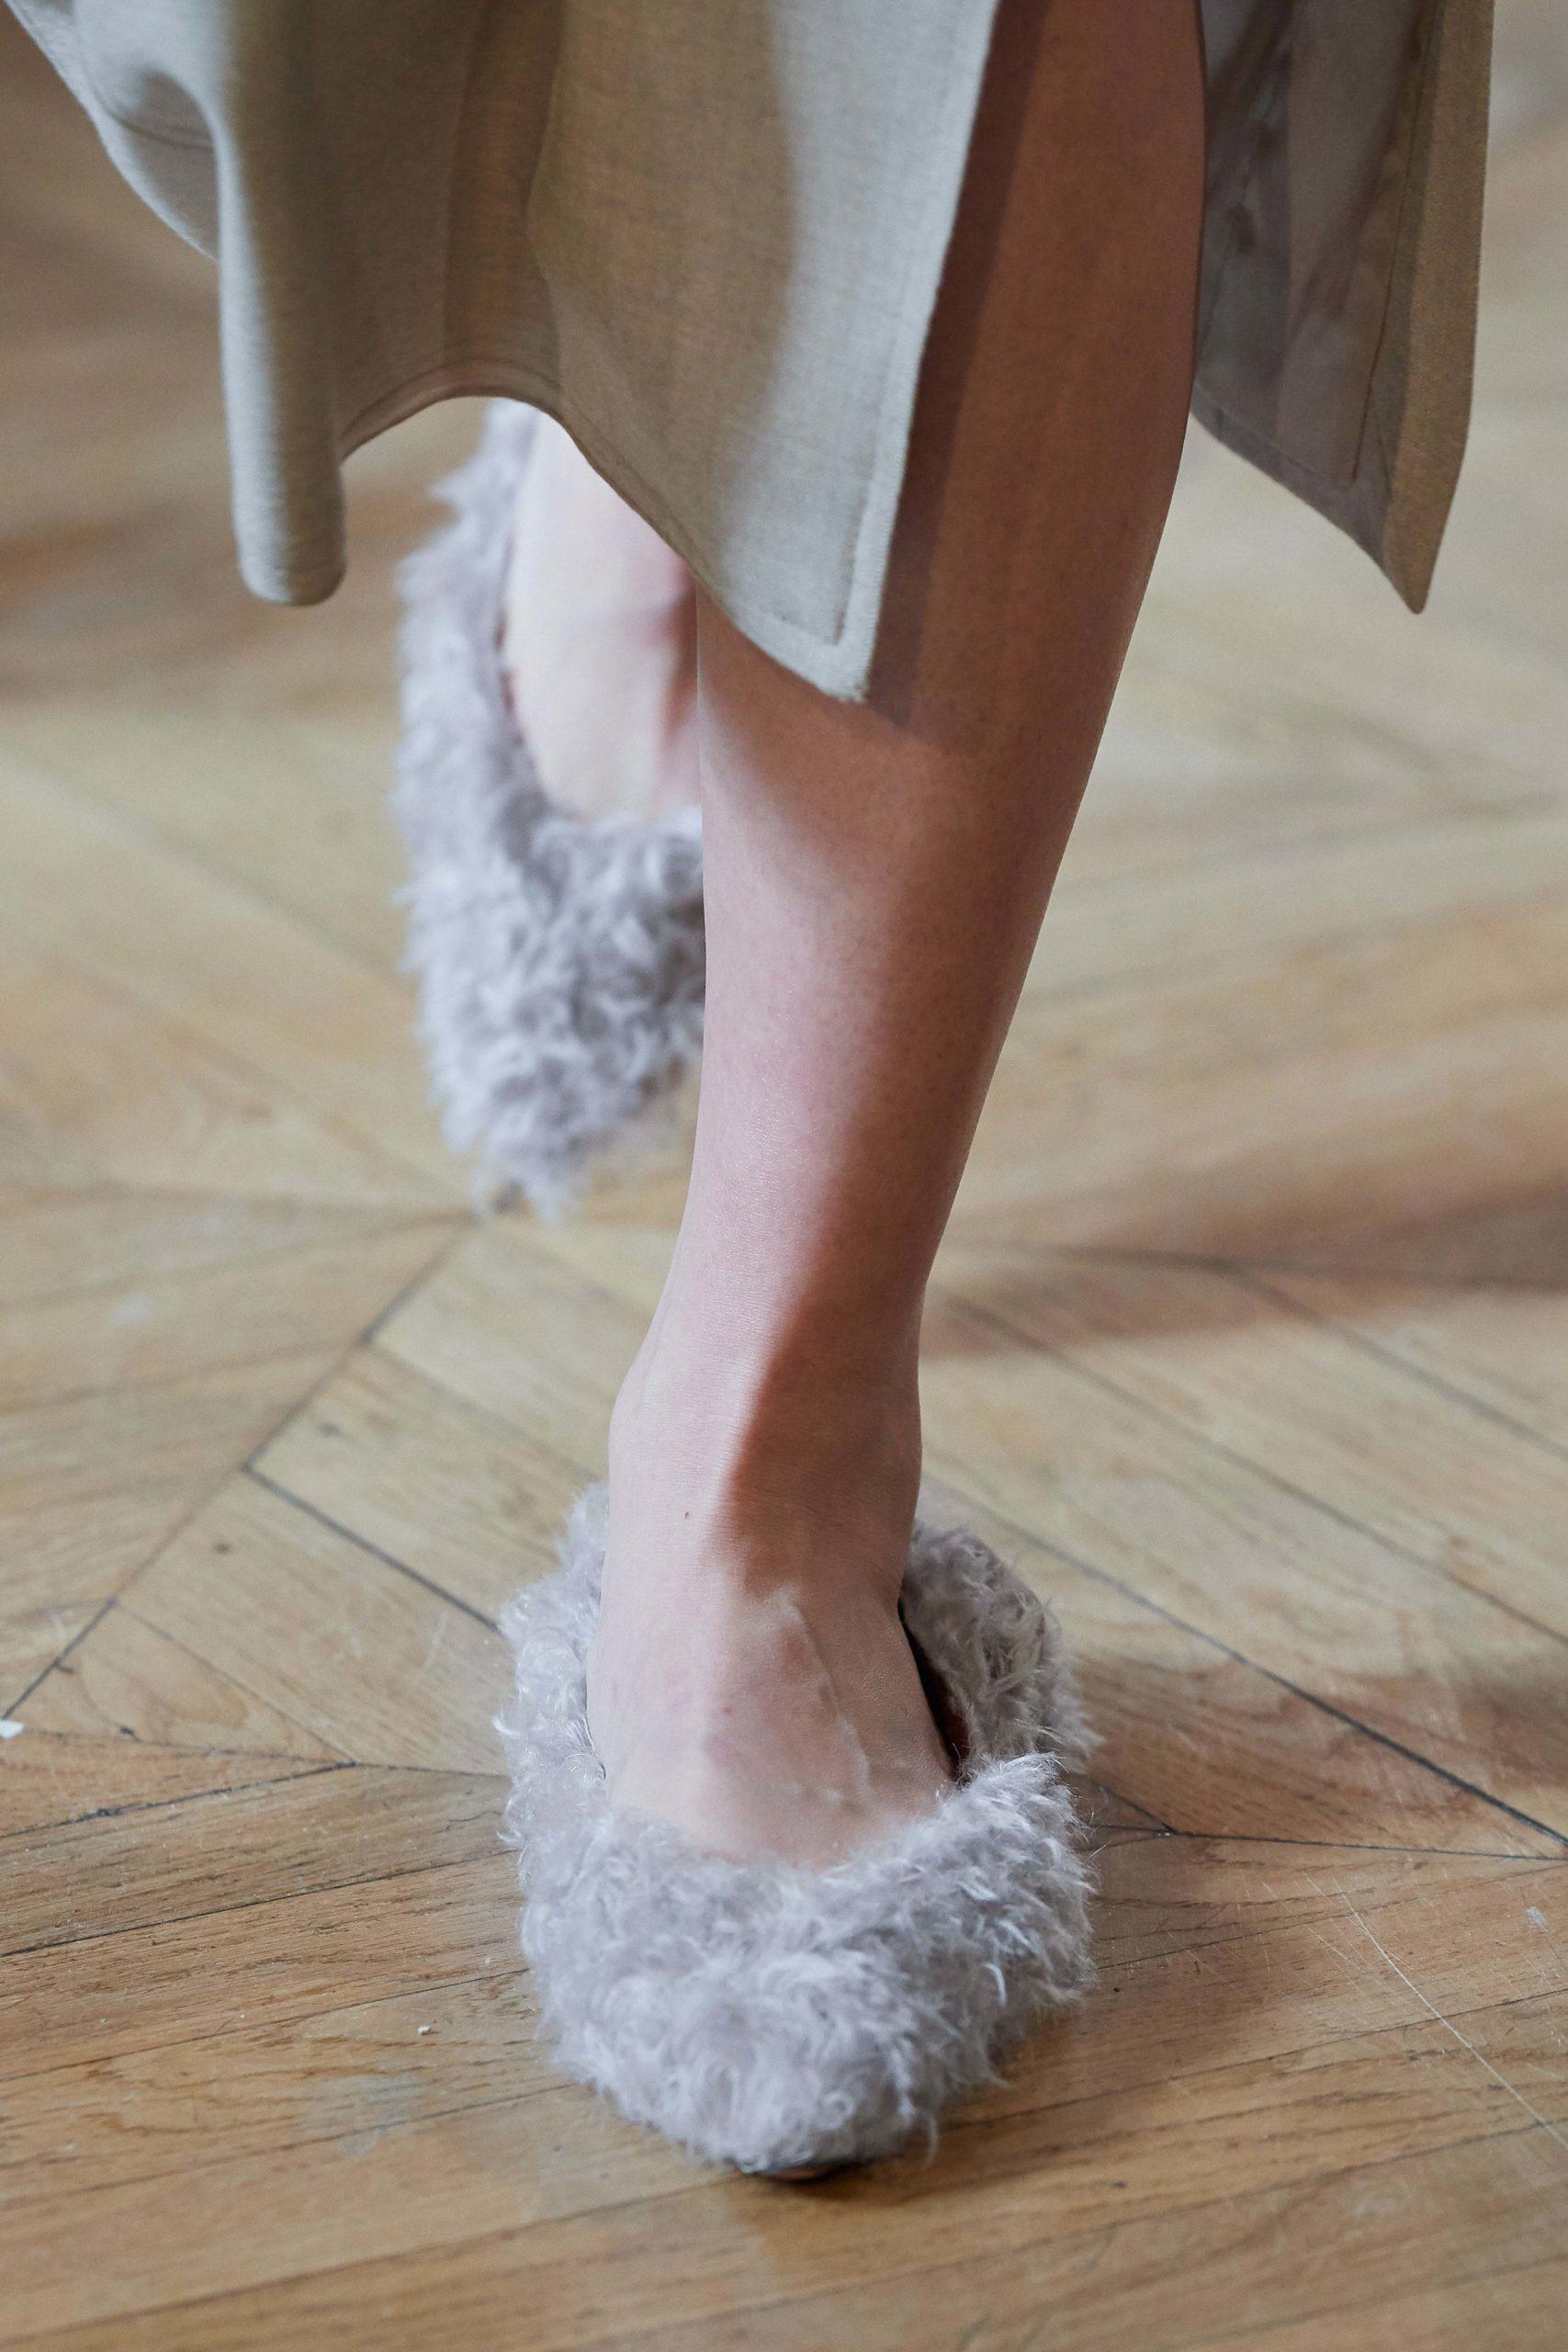 Altuzarra details Fall 2020 trends runway coverage Ready To Wear Vogue details shaggy